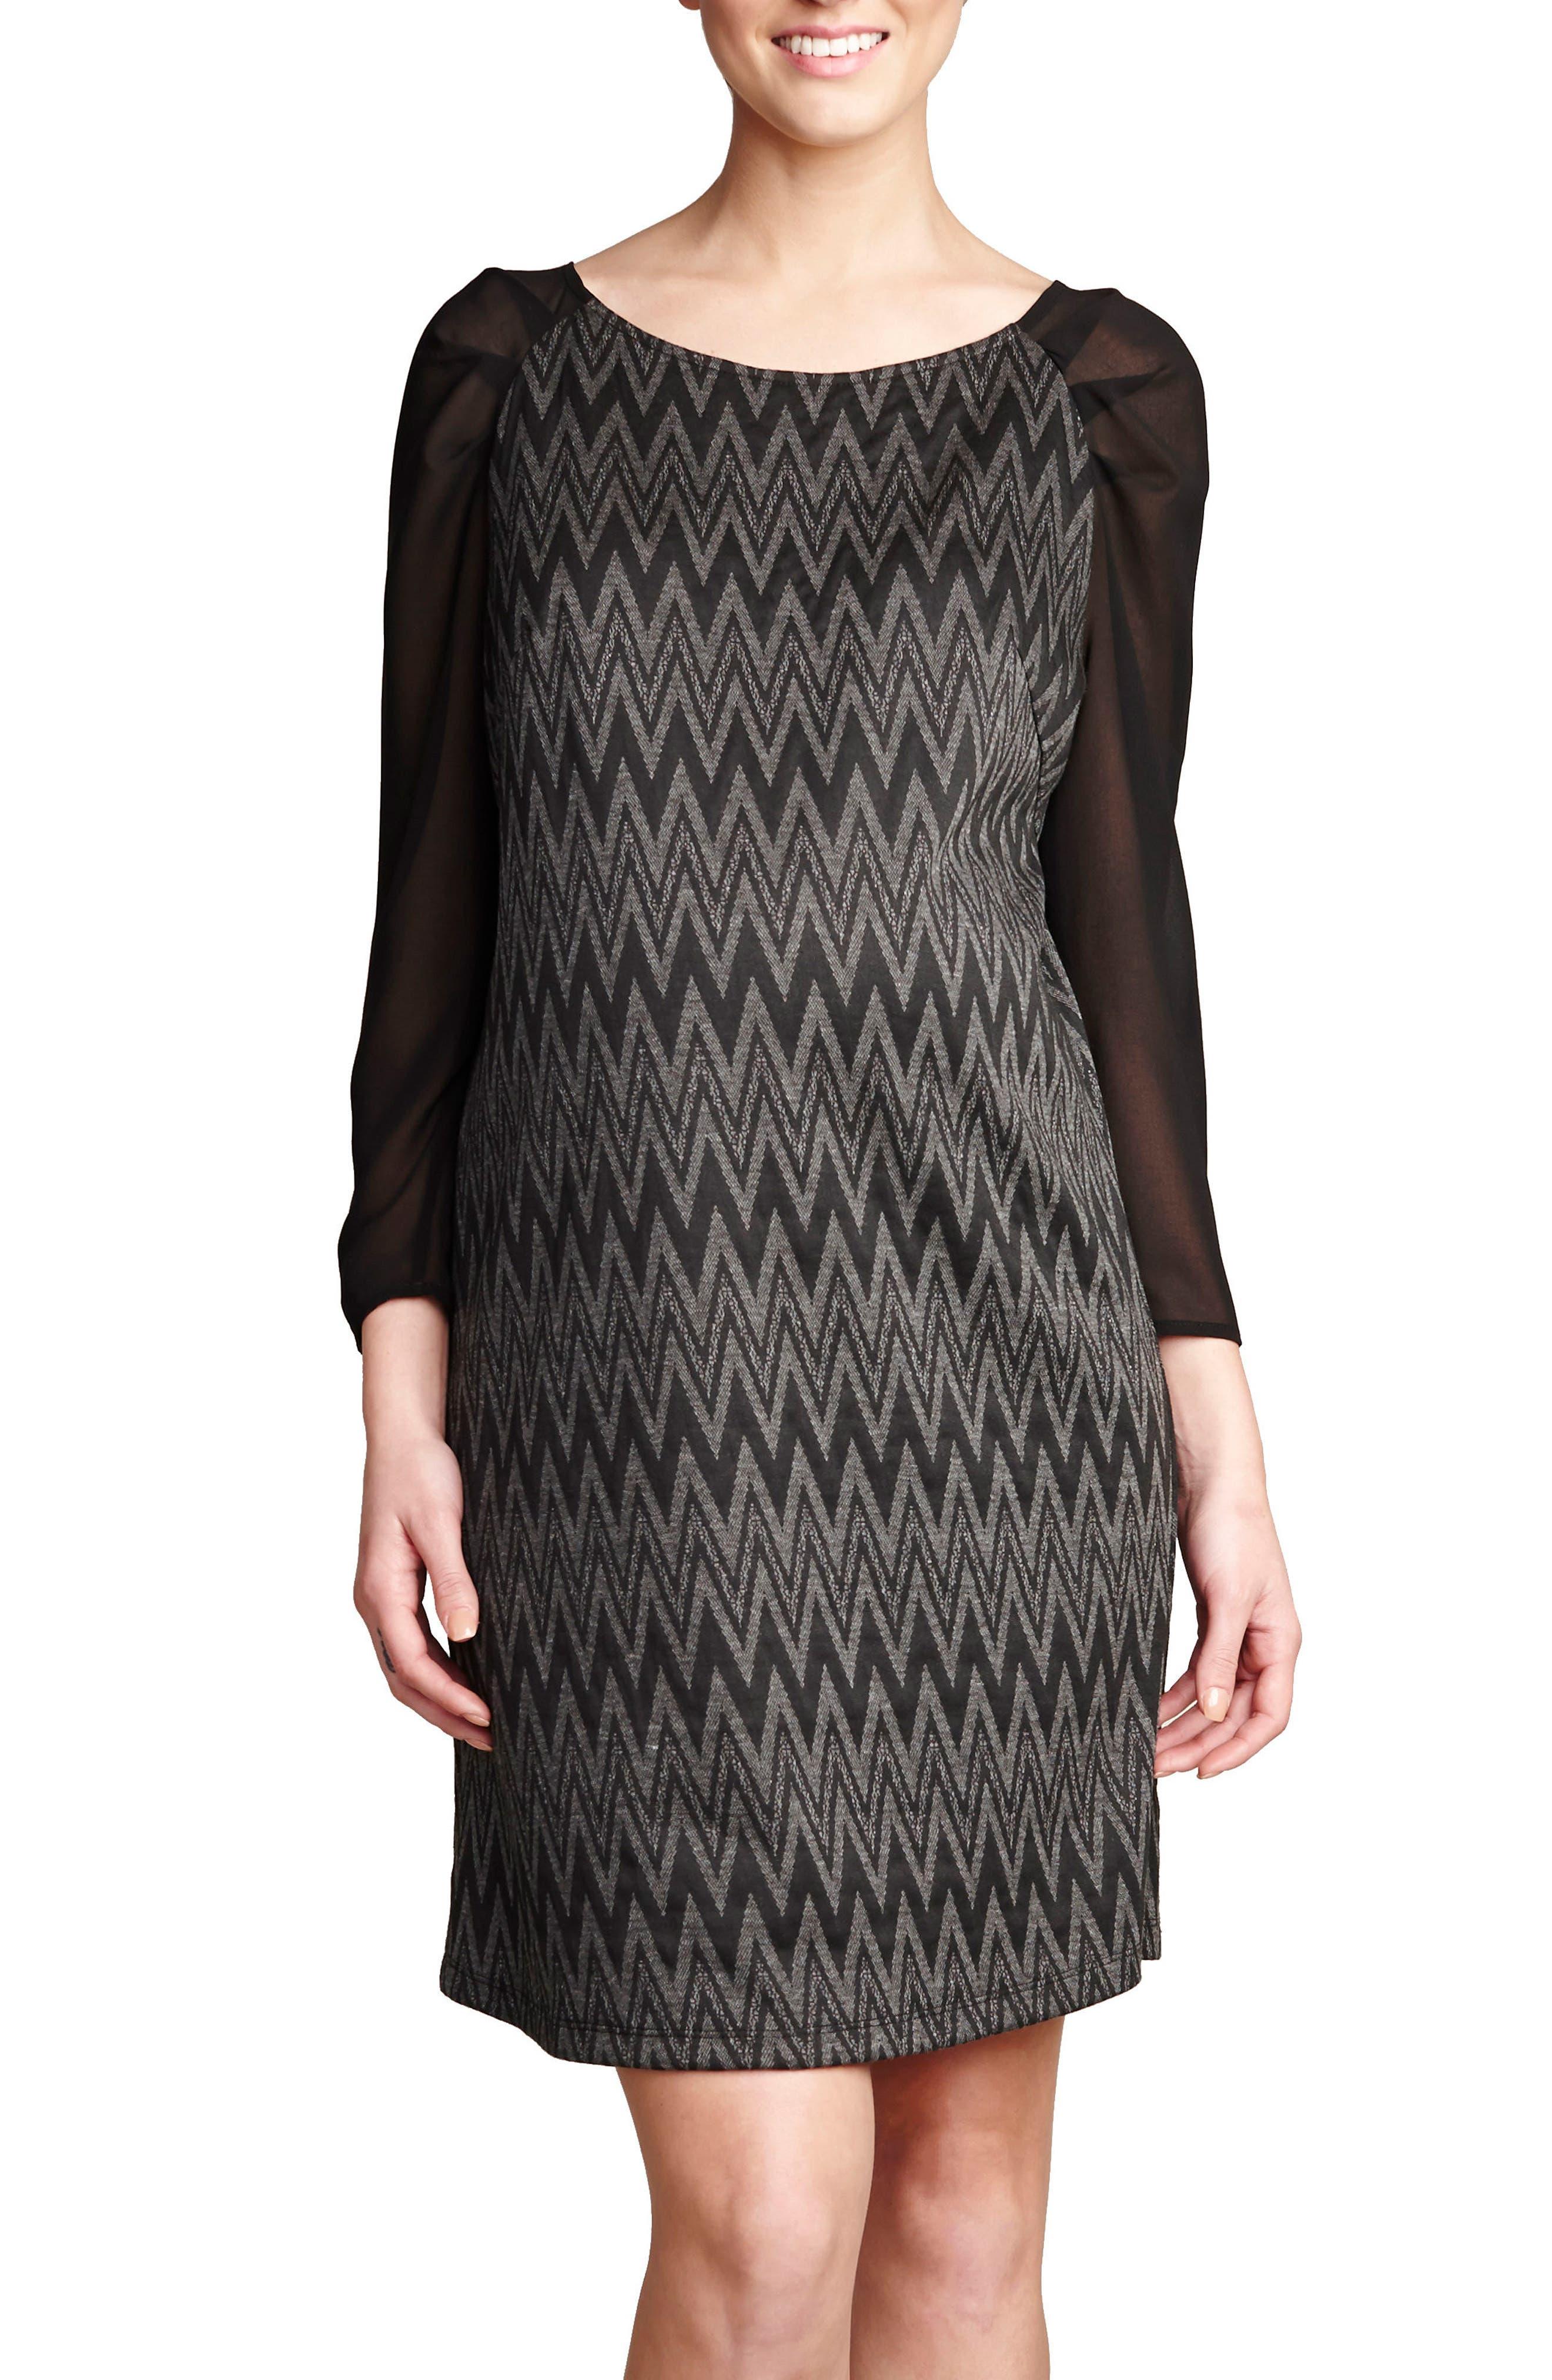 Chiffon Sleeve Maternity Dress,                             Alternate thumbnail 2, color,                             BLACK/ GREY ZIG ZAG